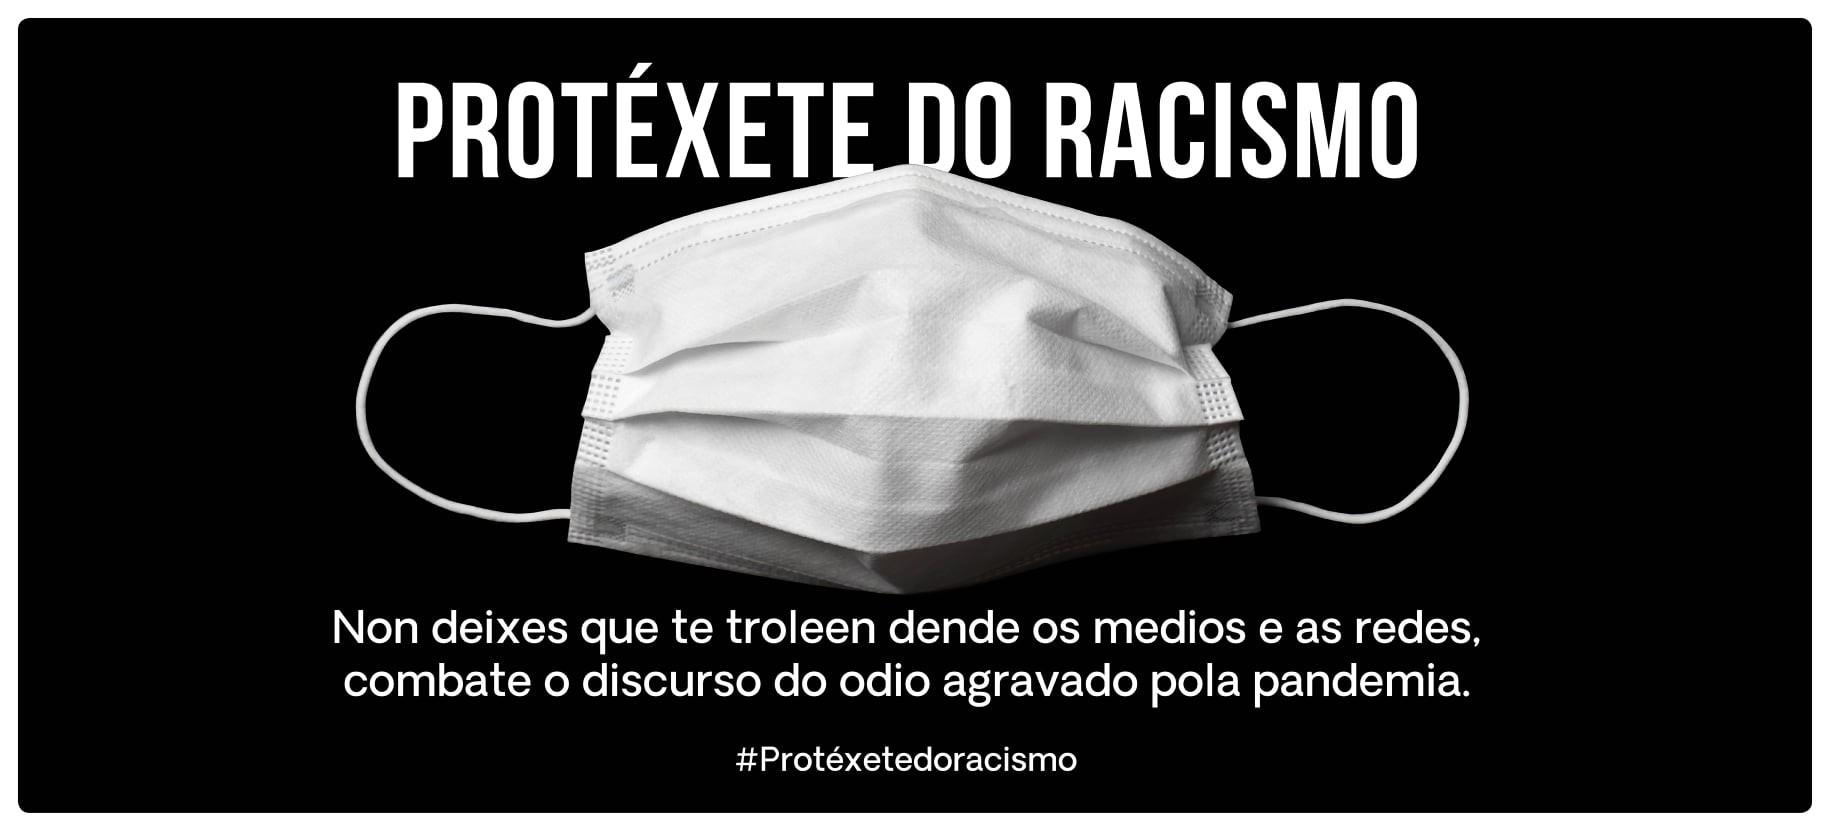 protéxete do racismo lugo